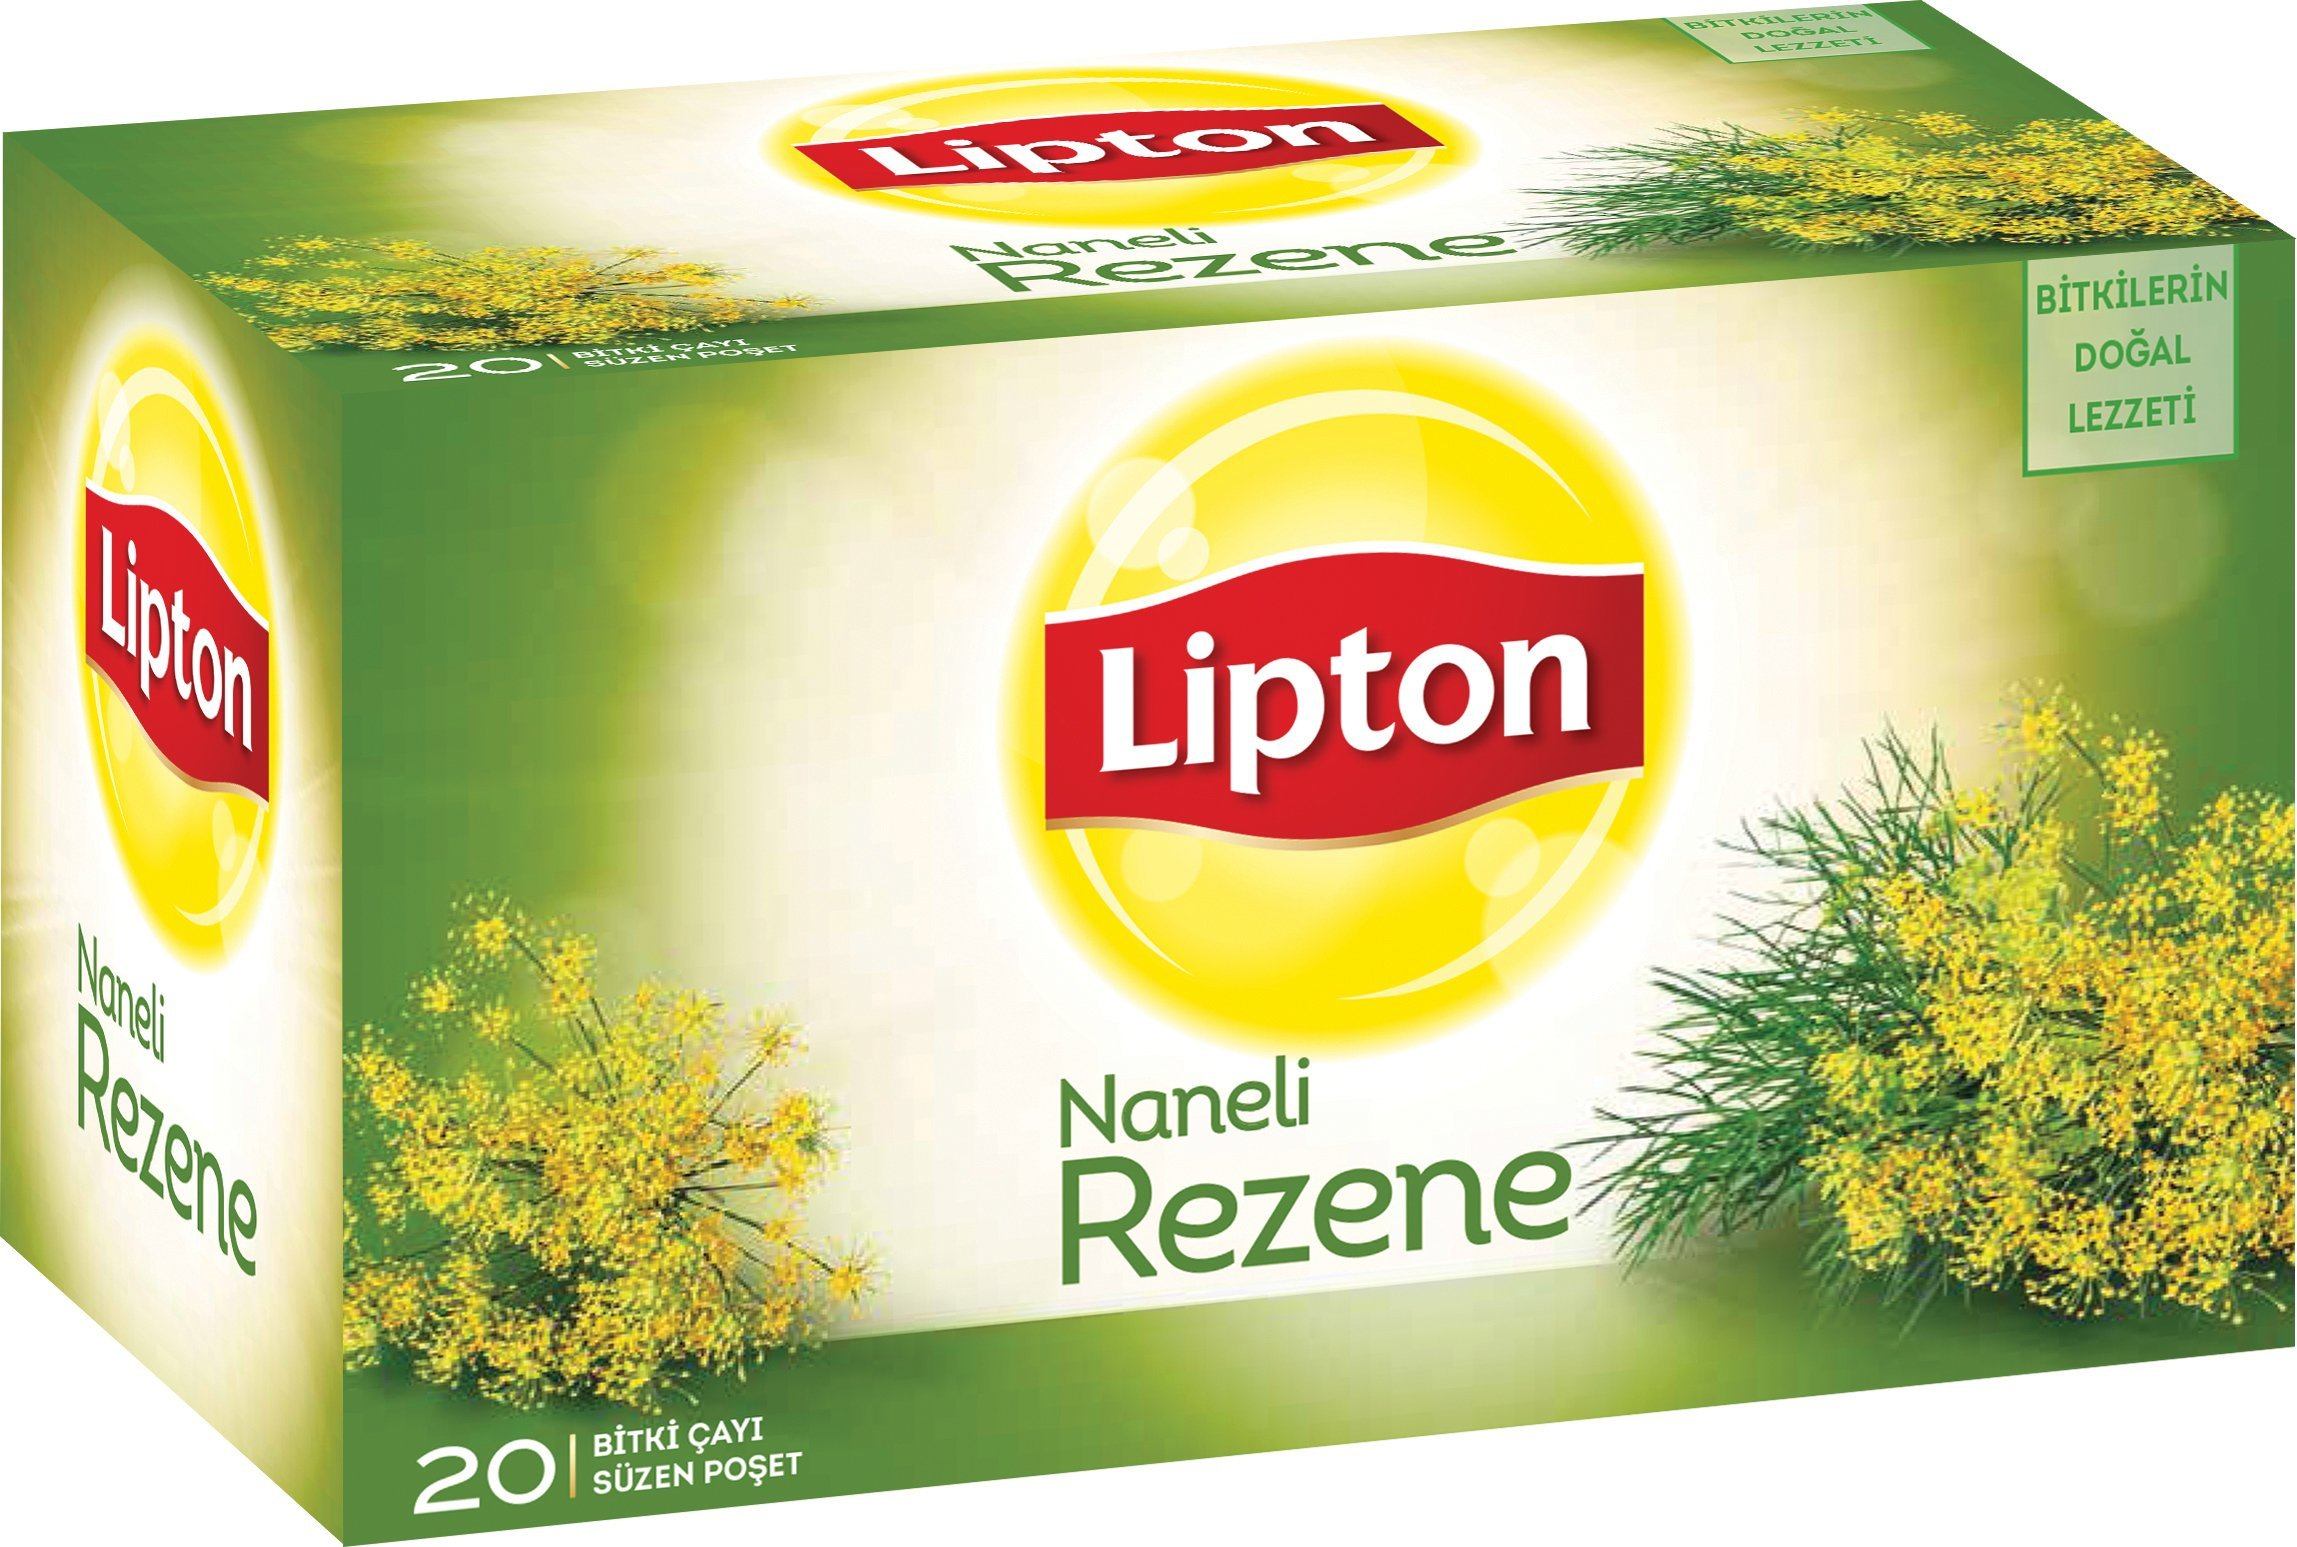 Lipton Rezene Bardak Poşet 20'li